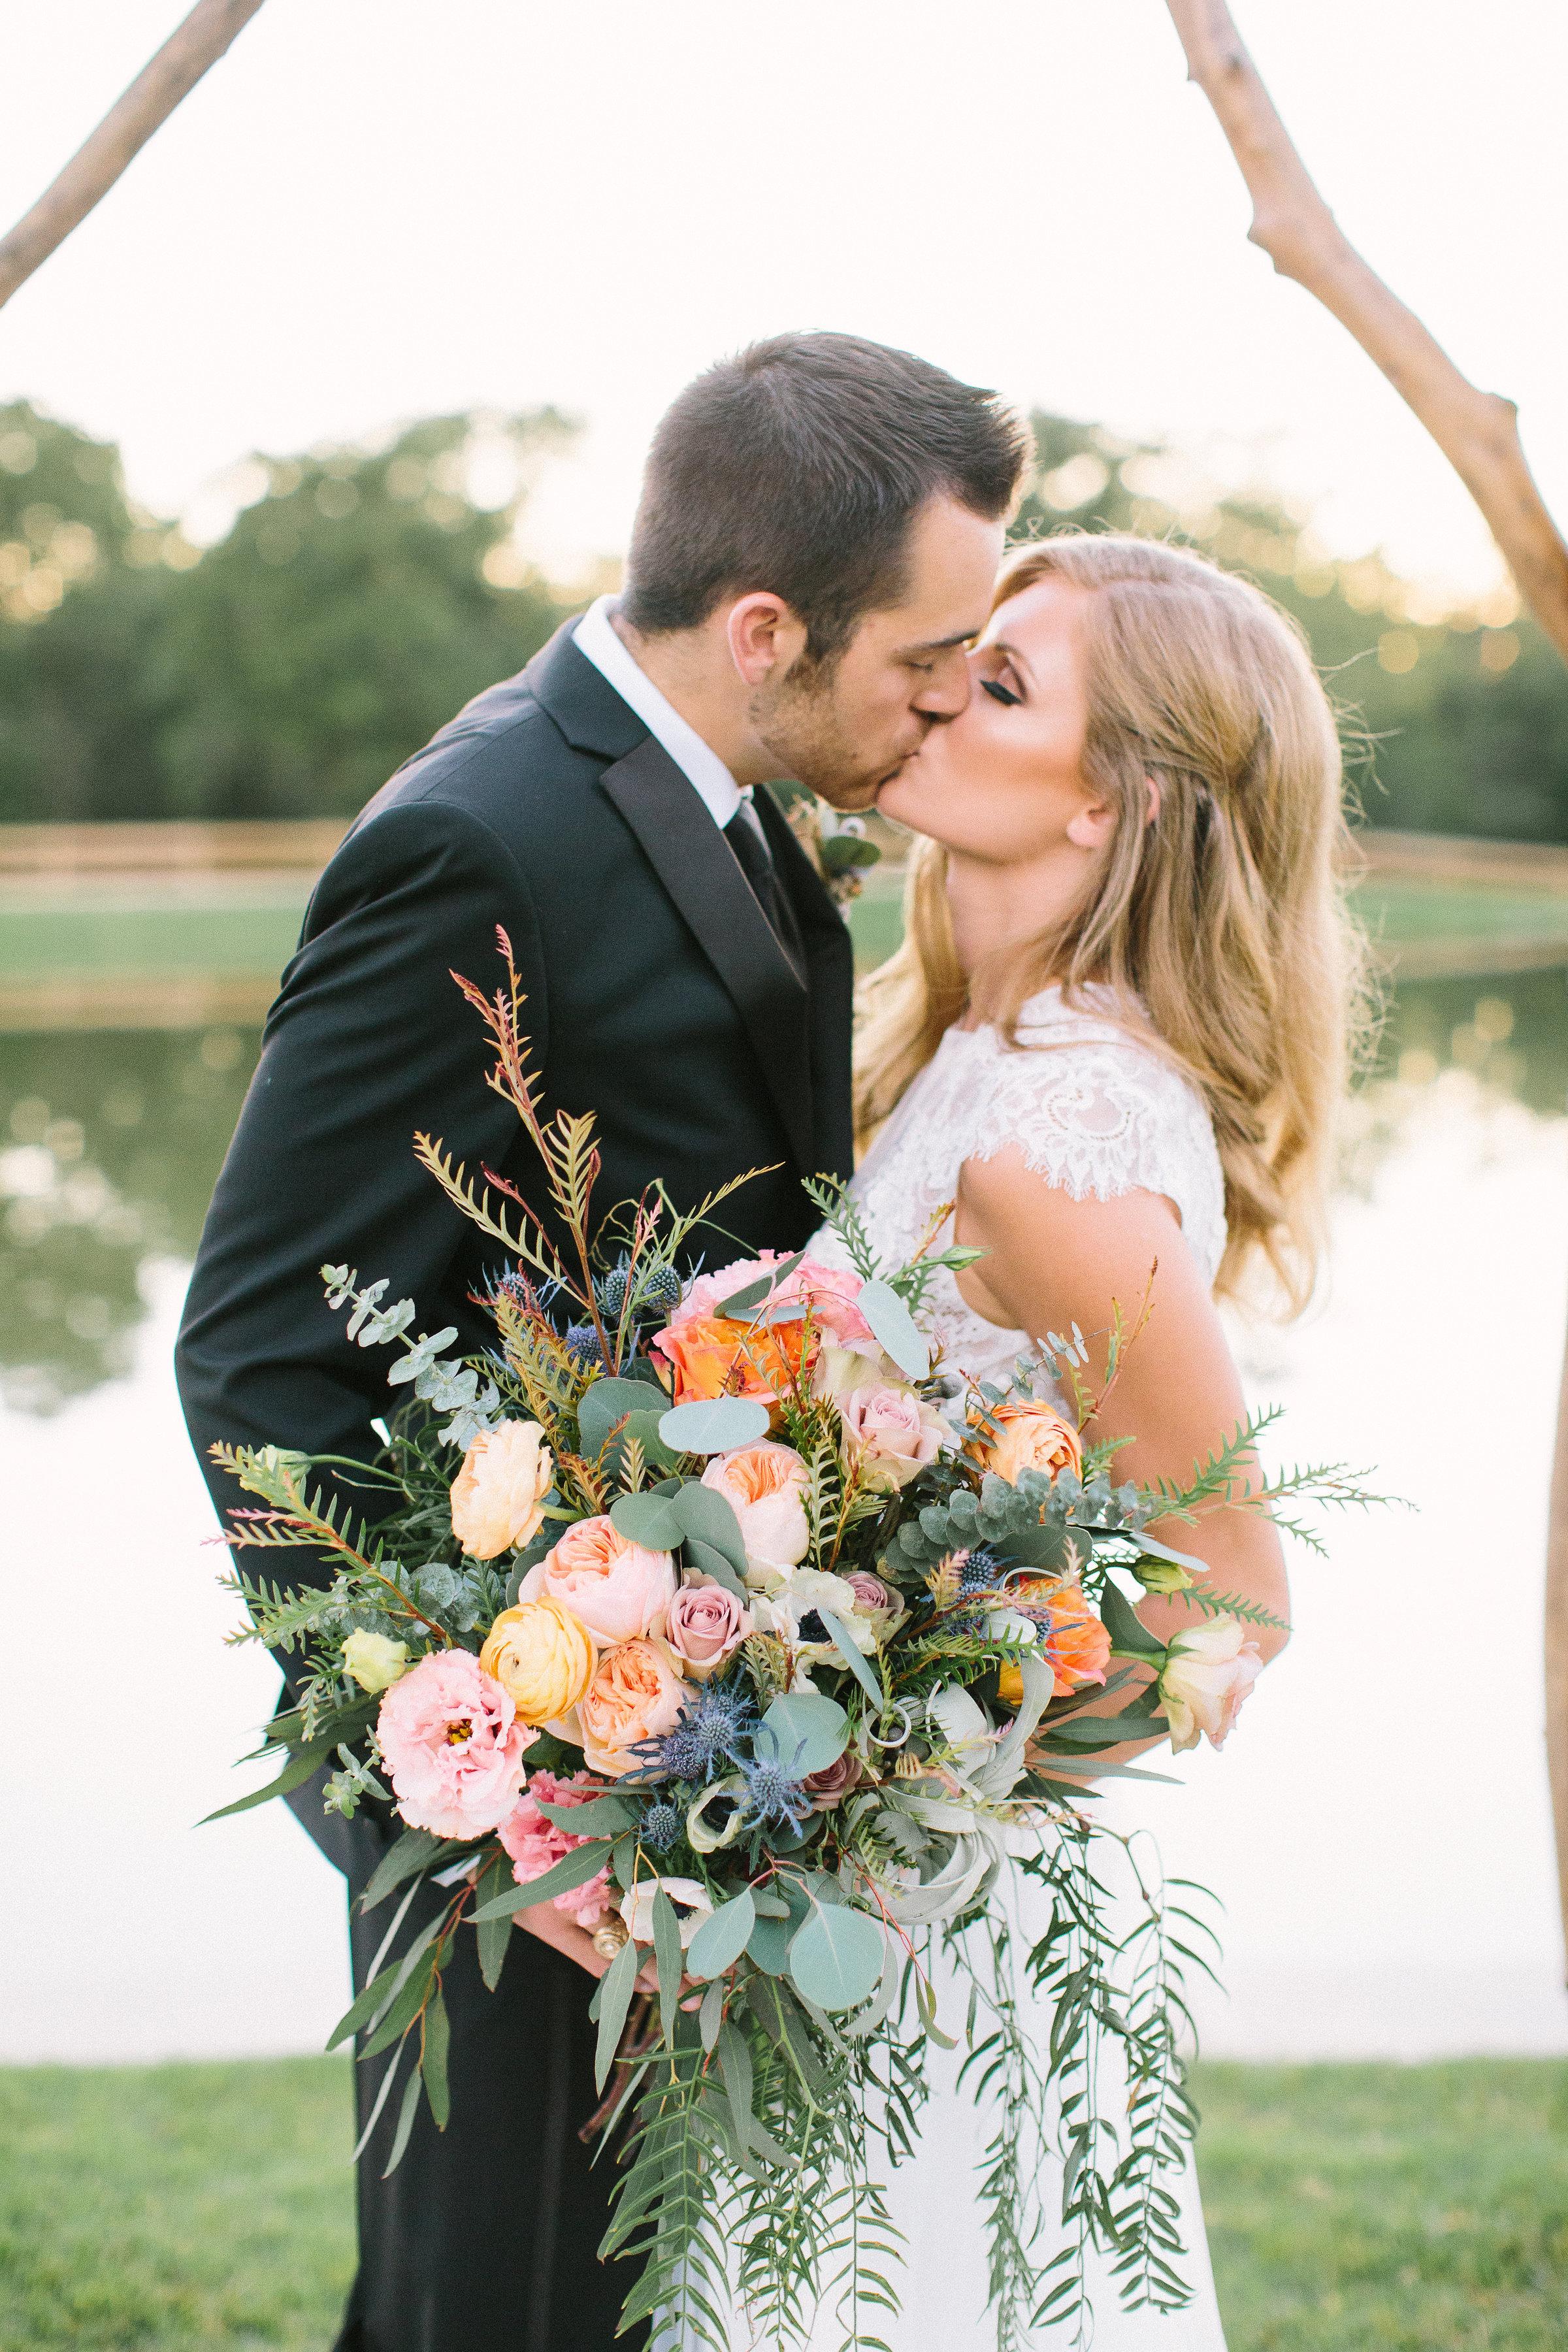 Ellen-Ashton-Photography-Peach-Creek-Ranch-Weddings-Wed-and-Prosper394